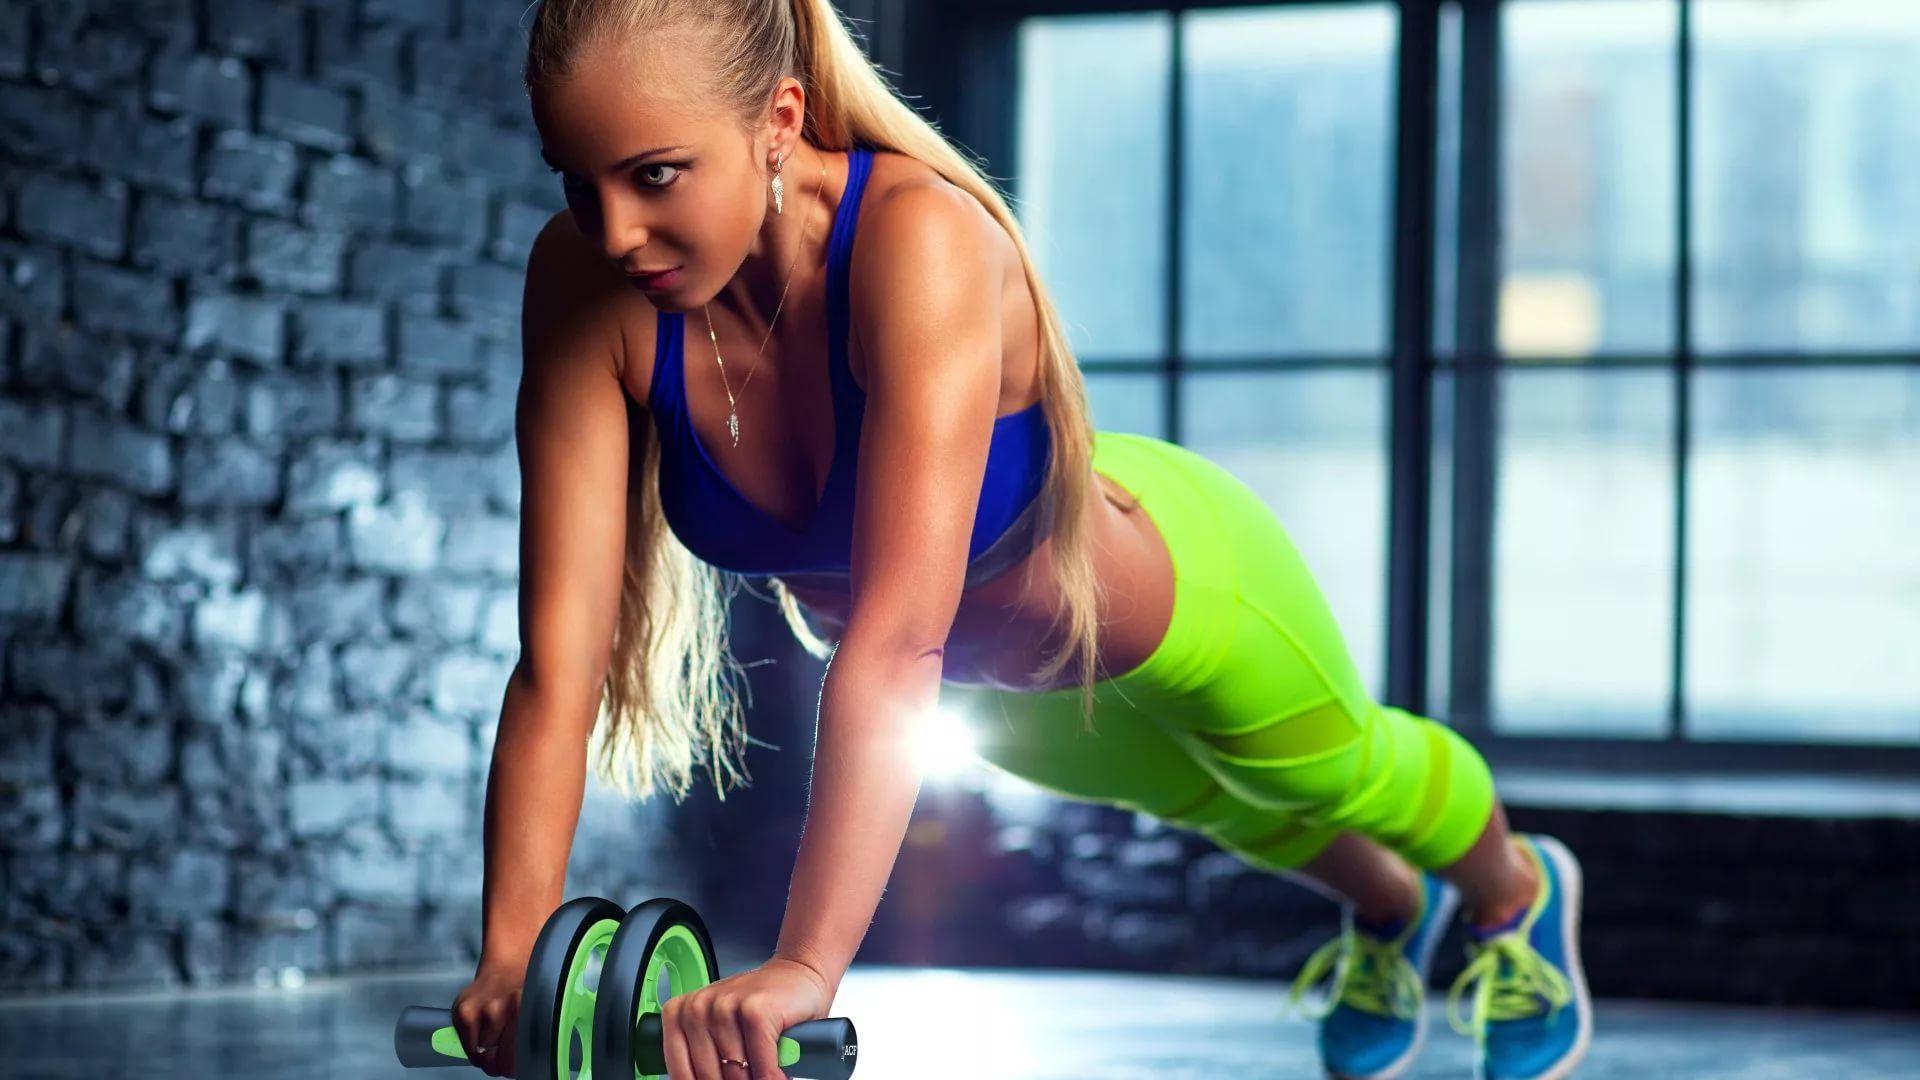 Workout download nice wallpaper